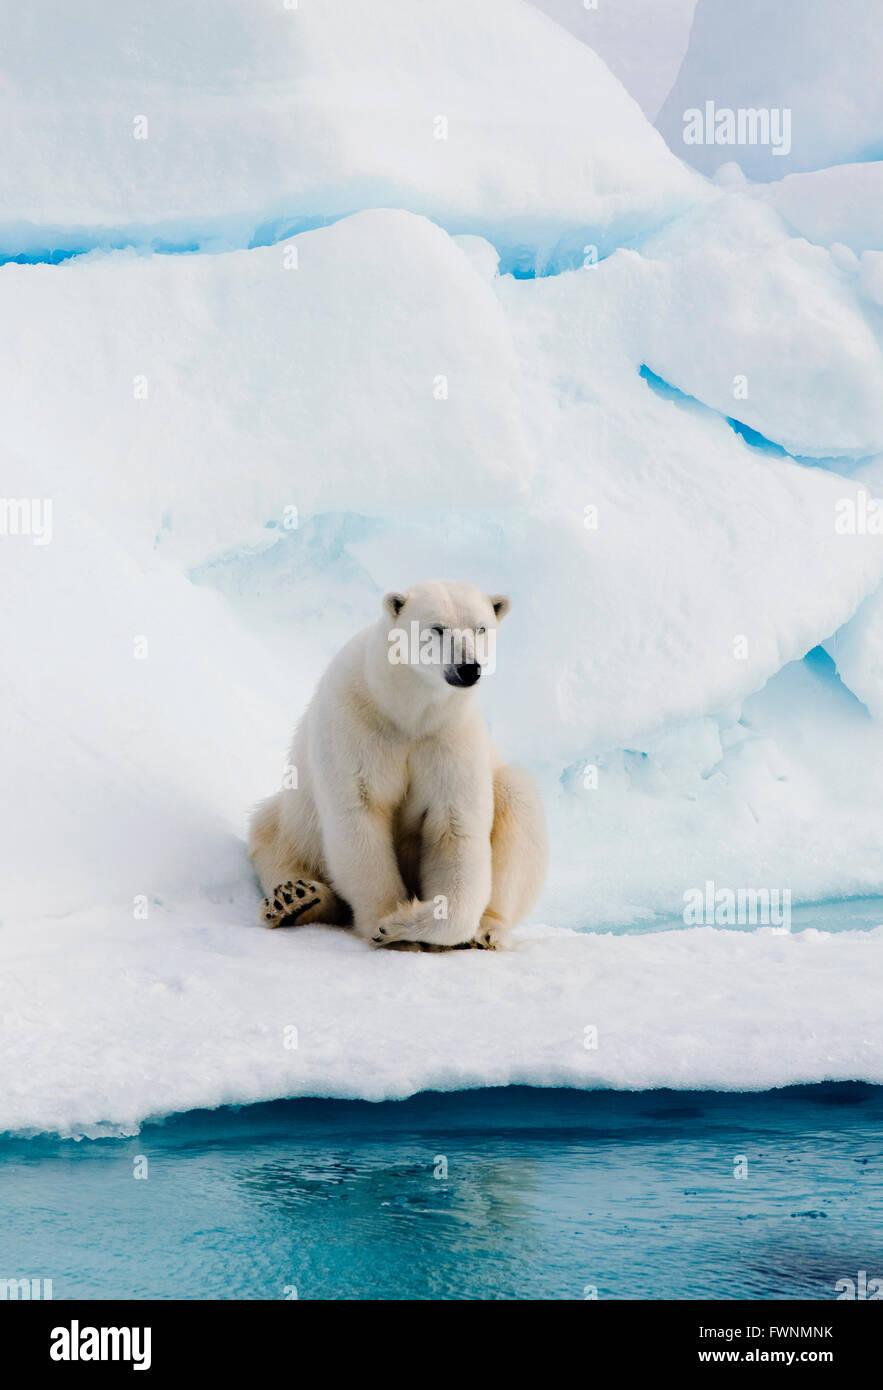 Polar Bear (Ursus maritimus)  On Pack Ice, Arctic  WILD - Stock Image